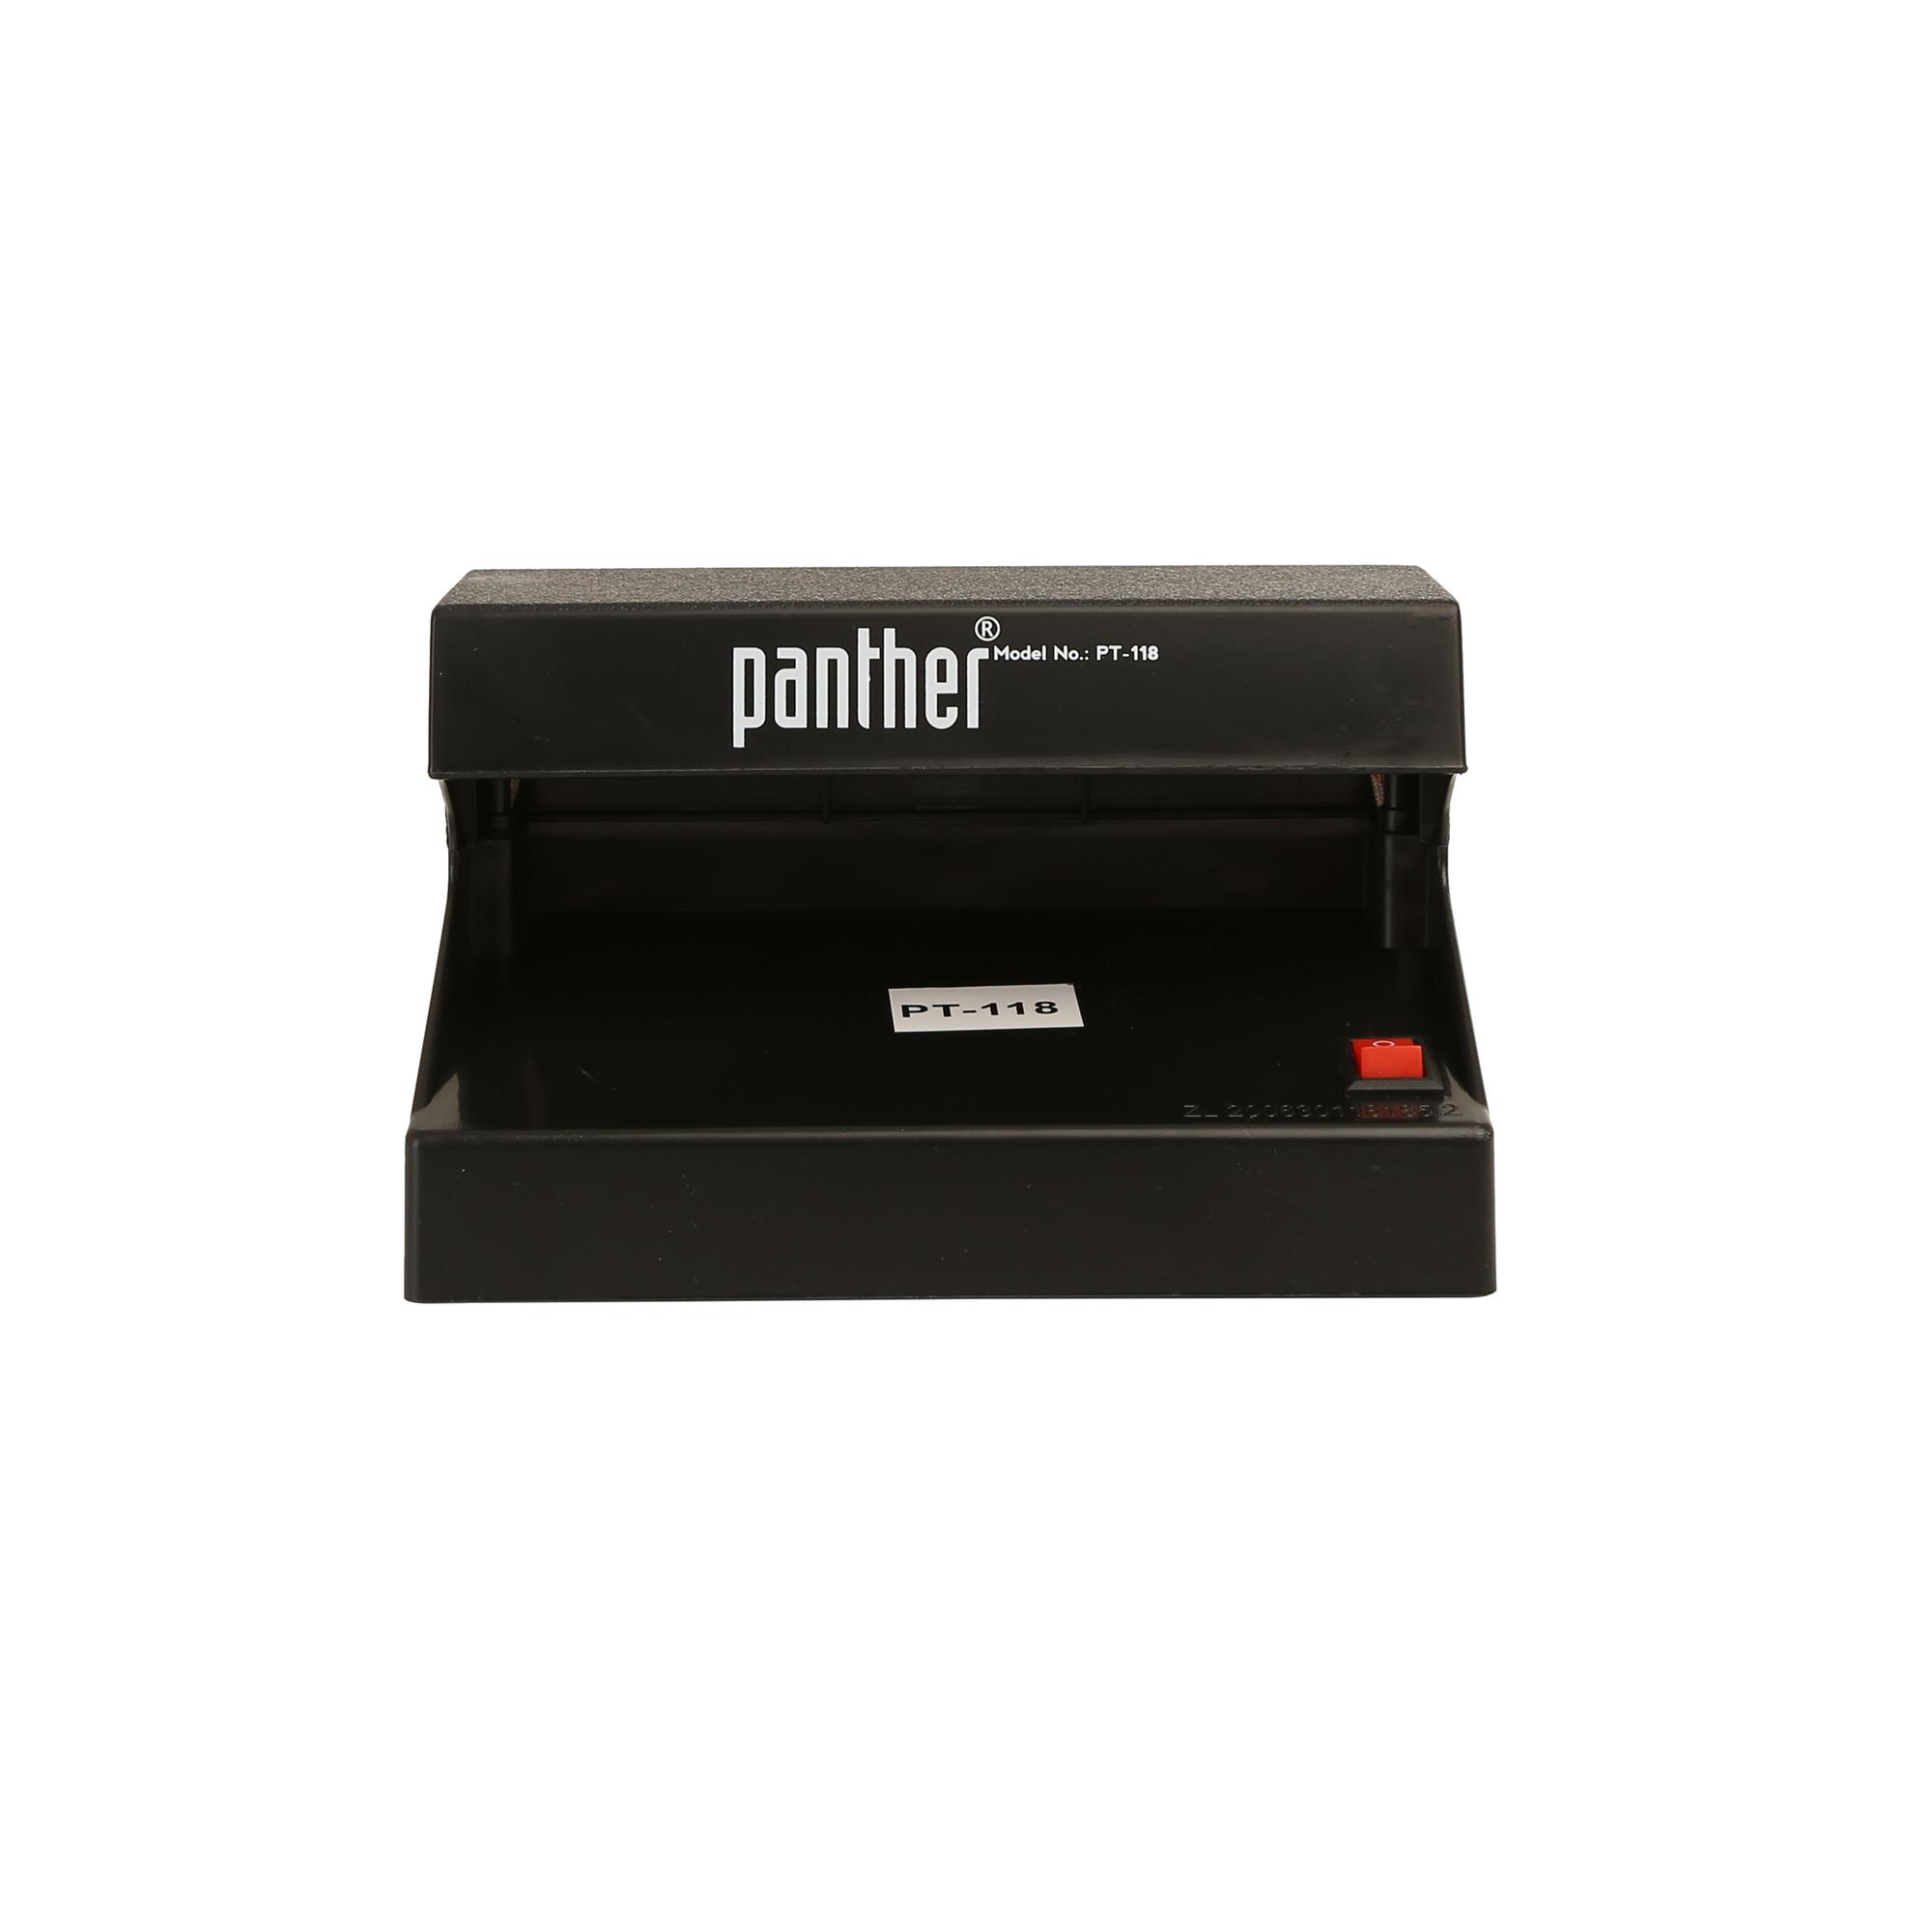 PANTHER PT-118 PARA KONTROL CİHAZI